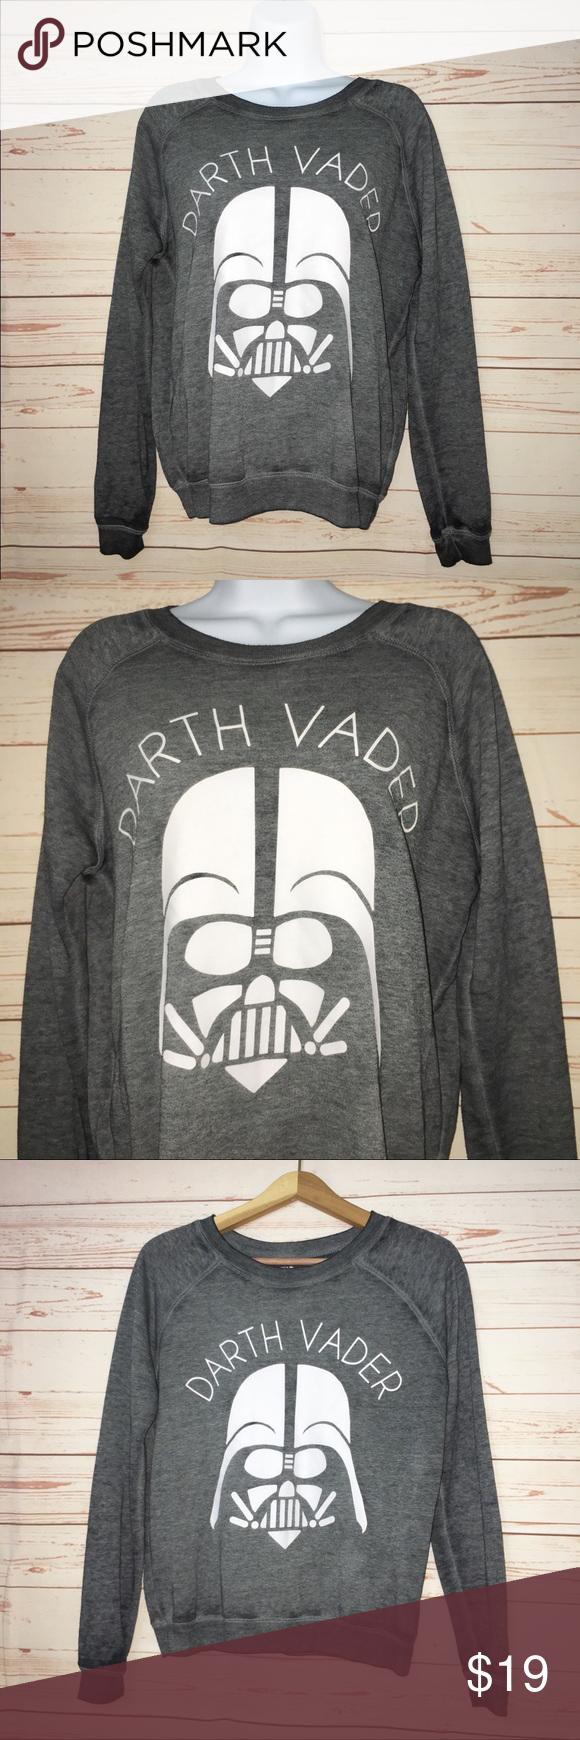 Star Wars Darth Vader Distressed Gray Sweatshirt S Sweatshirts Grey Sweatshirt Clothes Design [ 1740 x 580 Pixel ]